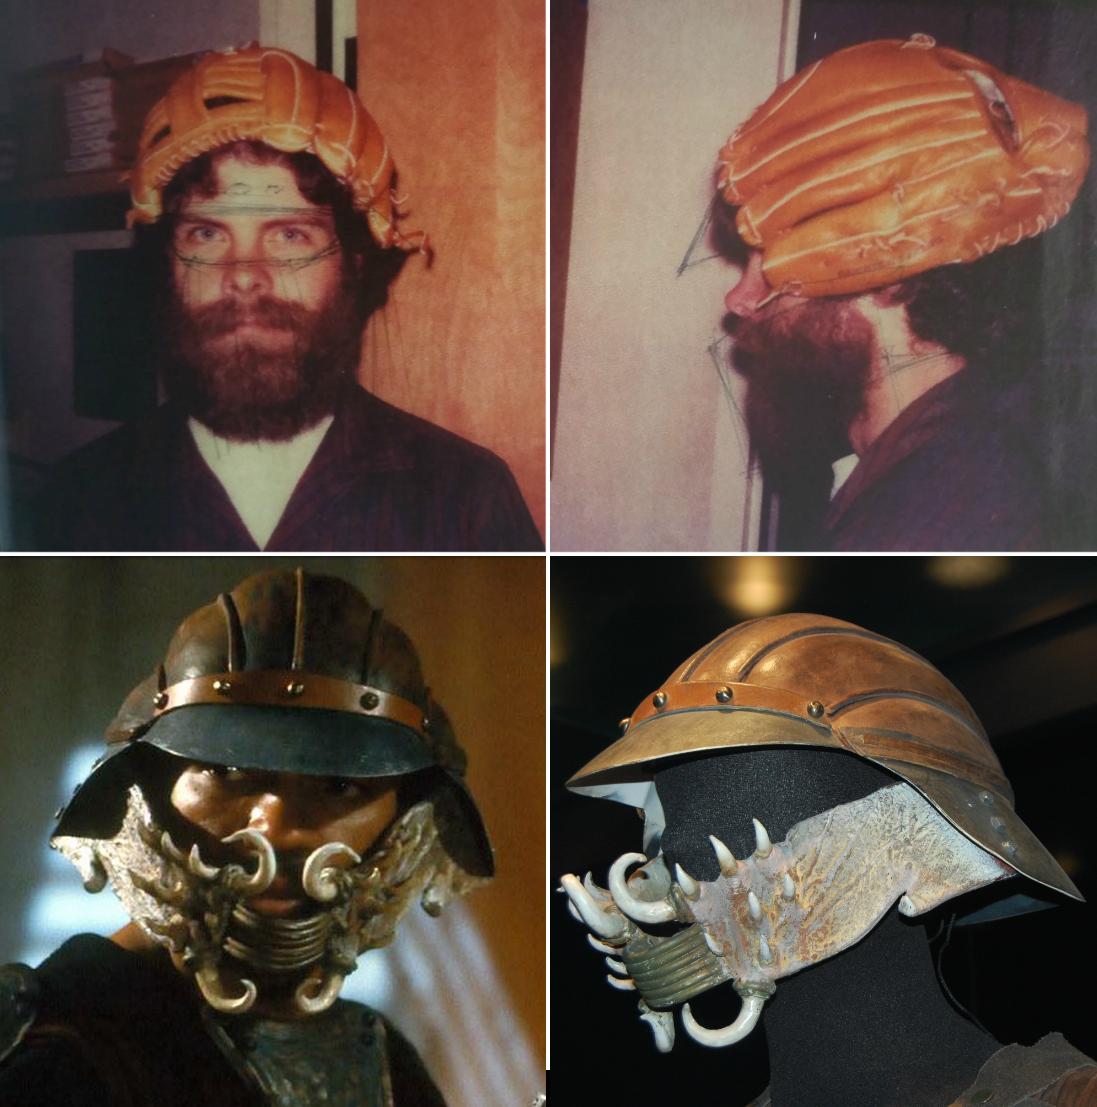 The Inspiration Behind Lando Calrissian's Helmet Design